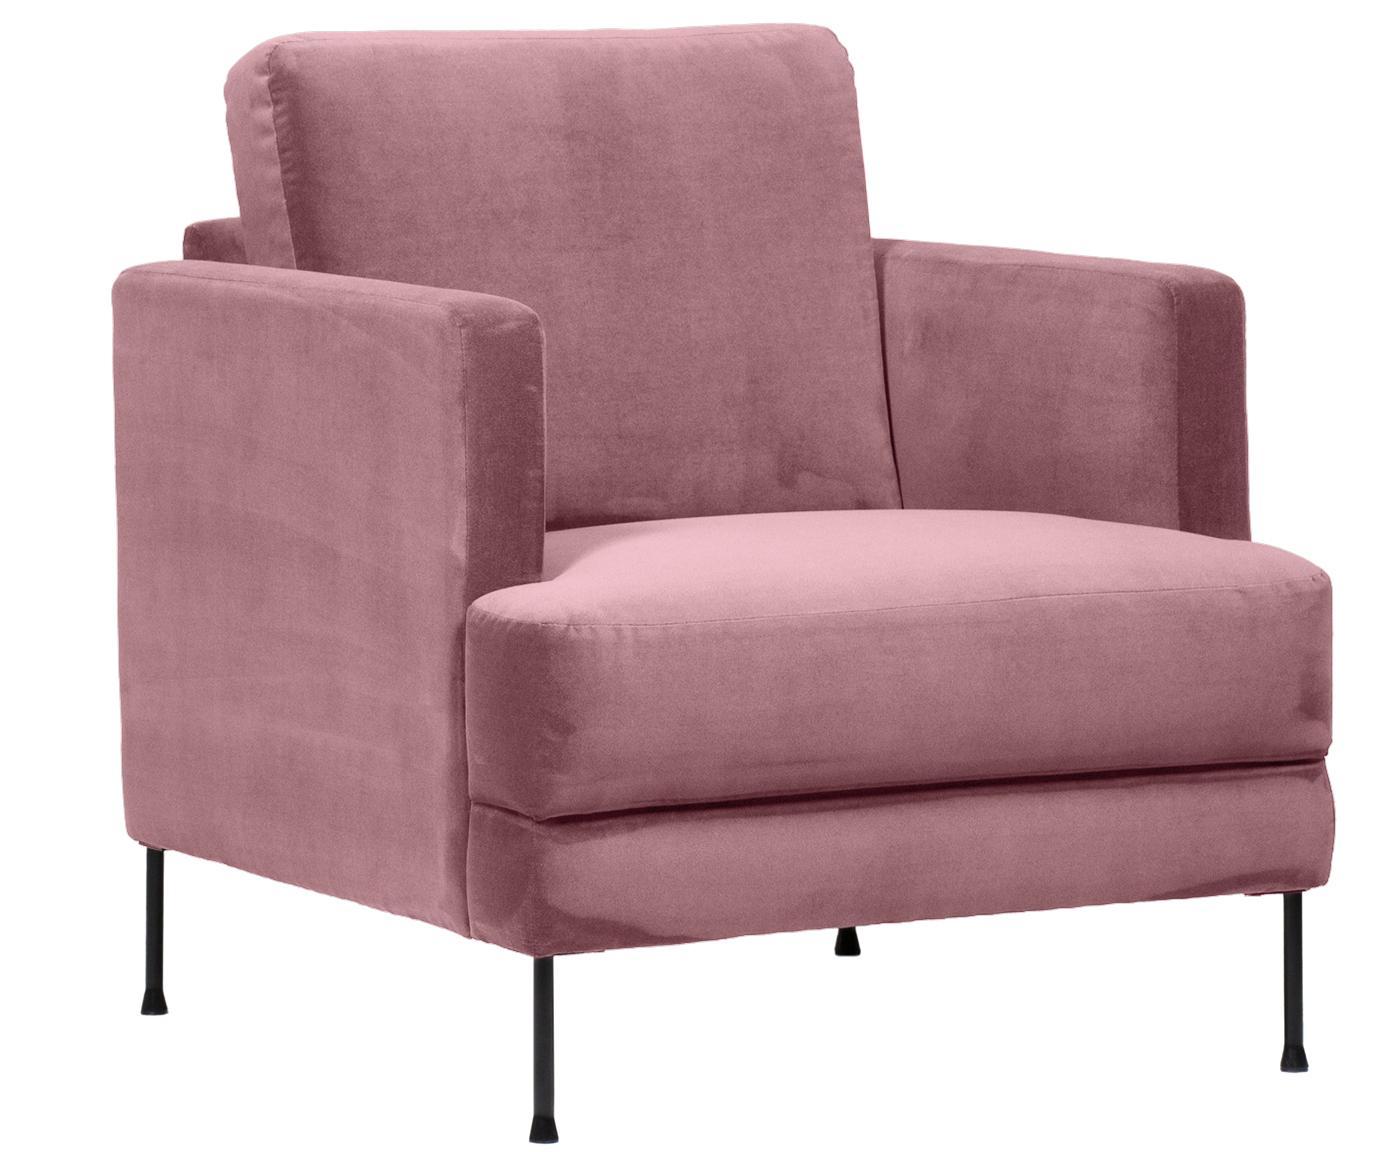 Samt-Sessel Fluente, Bezug: Samt (Hochwertiger Polyes, Gestell: Massives Kiefernholz, Samt Rosa, B 76 x T 83 cm